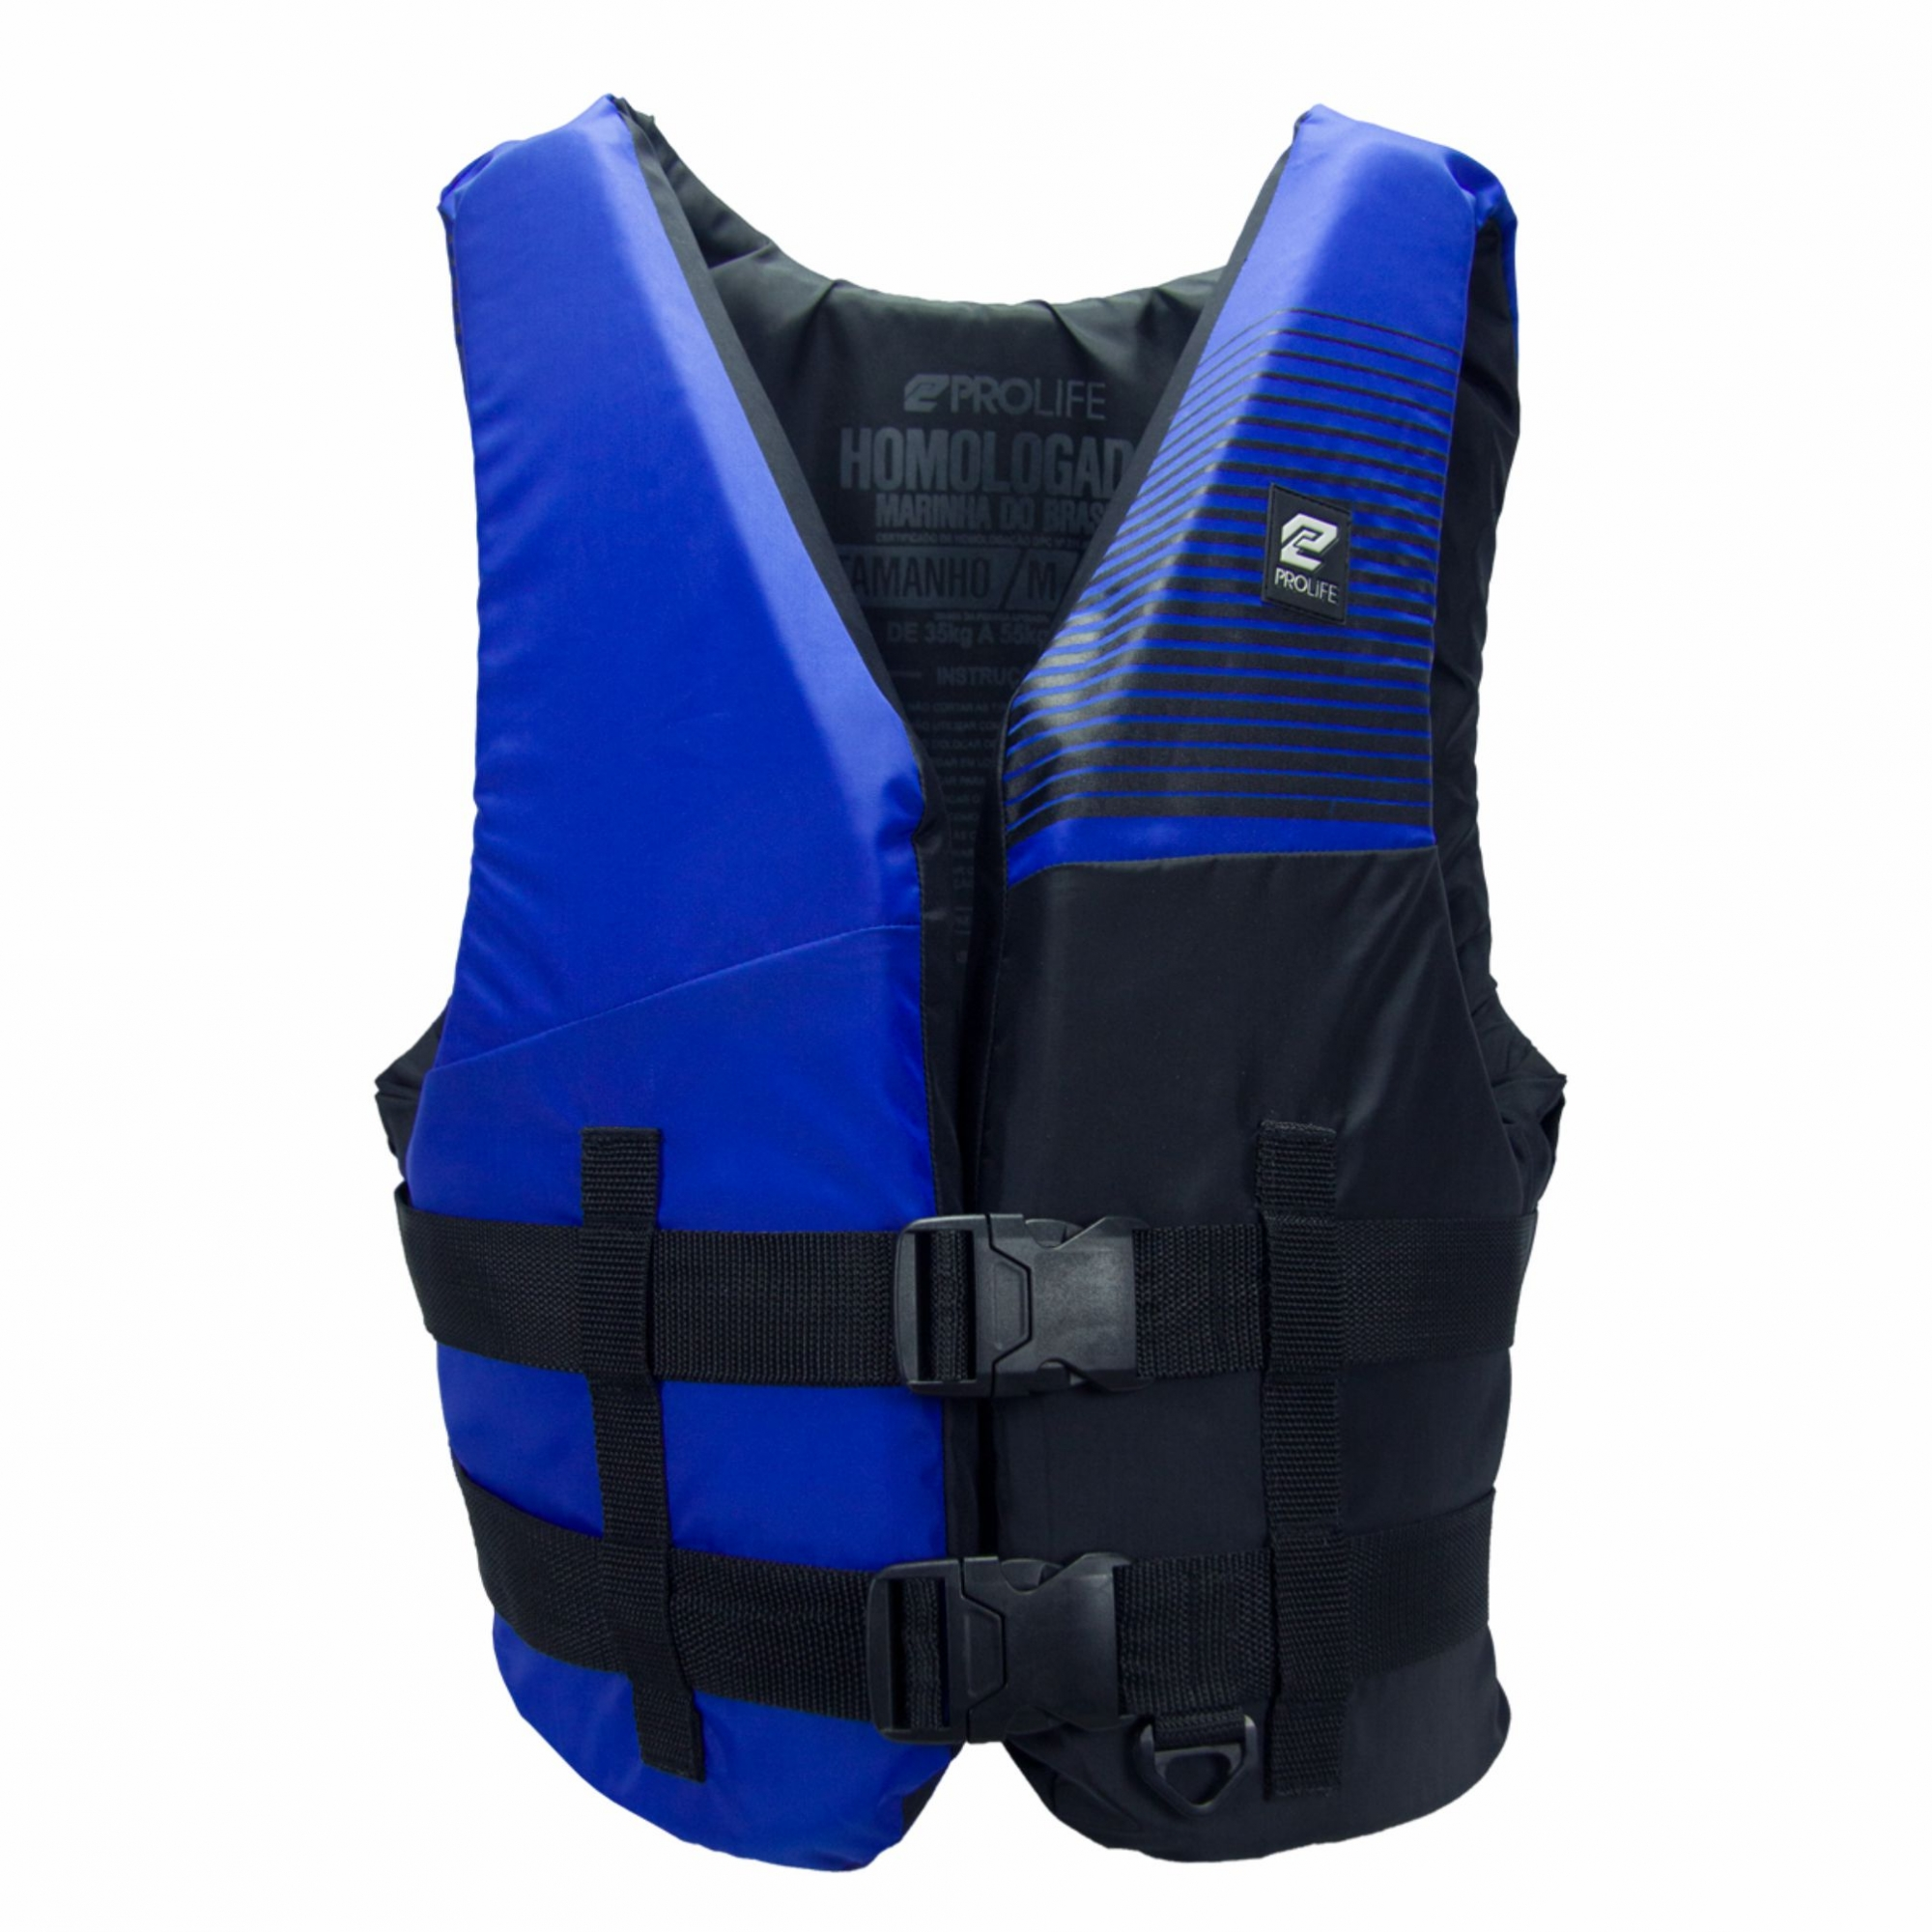 Colete Salva Vidas ProLife N1 Homologado Classe 5 Azul  - Pesca Adventure